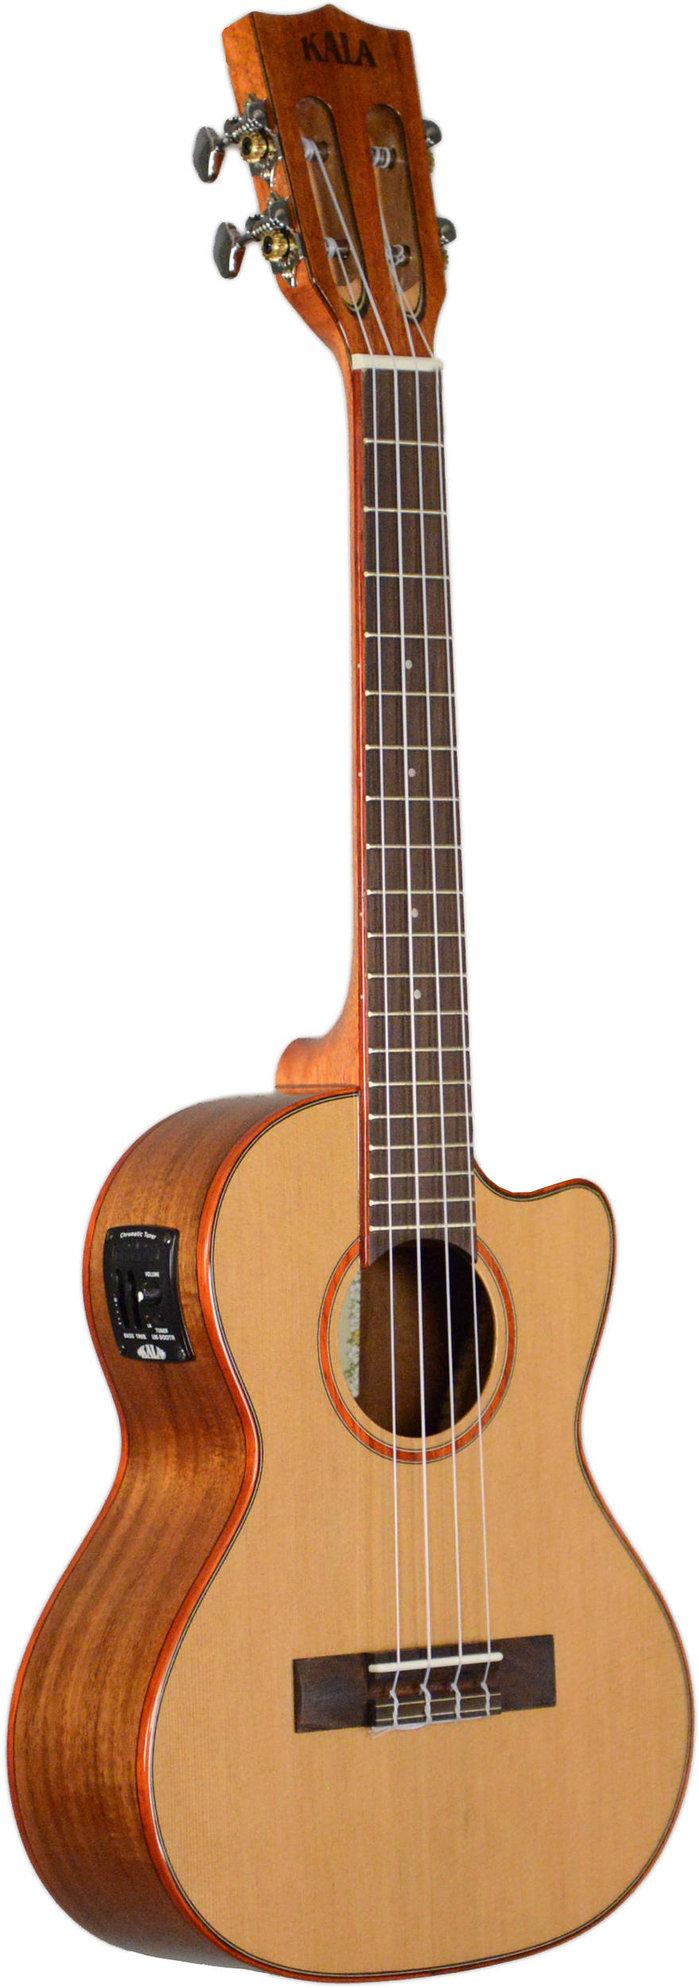 Kala Cedar Top Acoustic Electric Uke